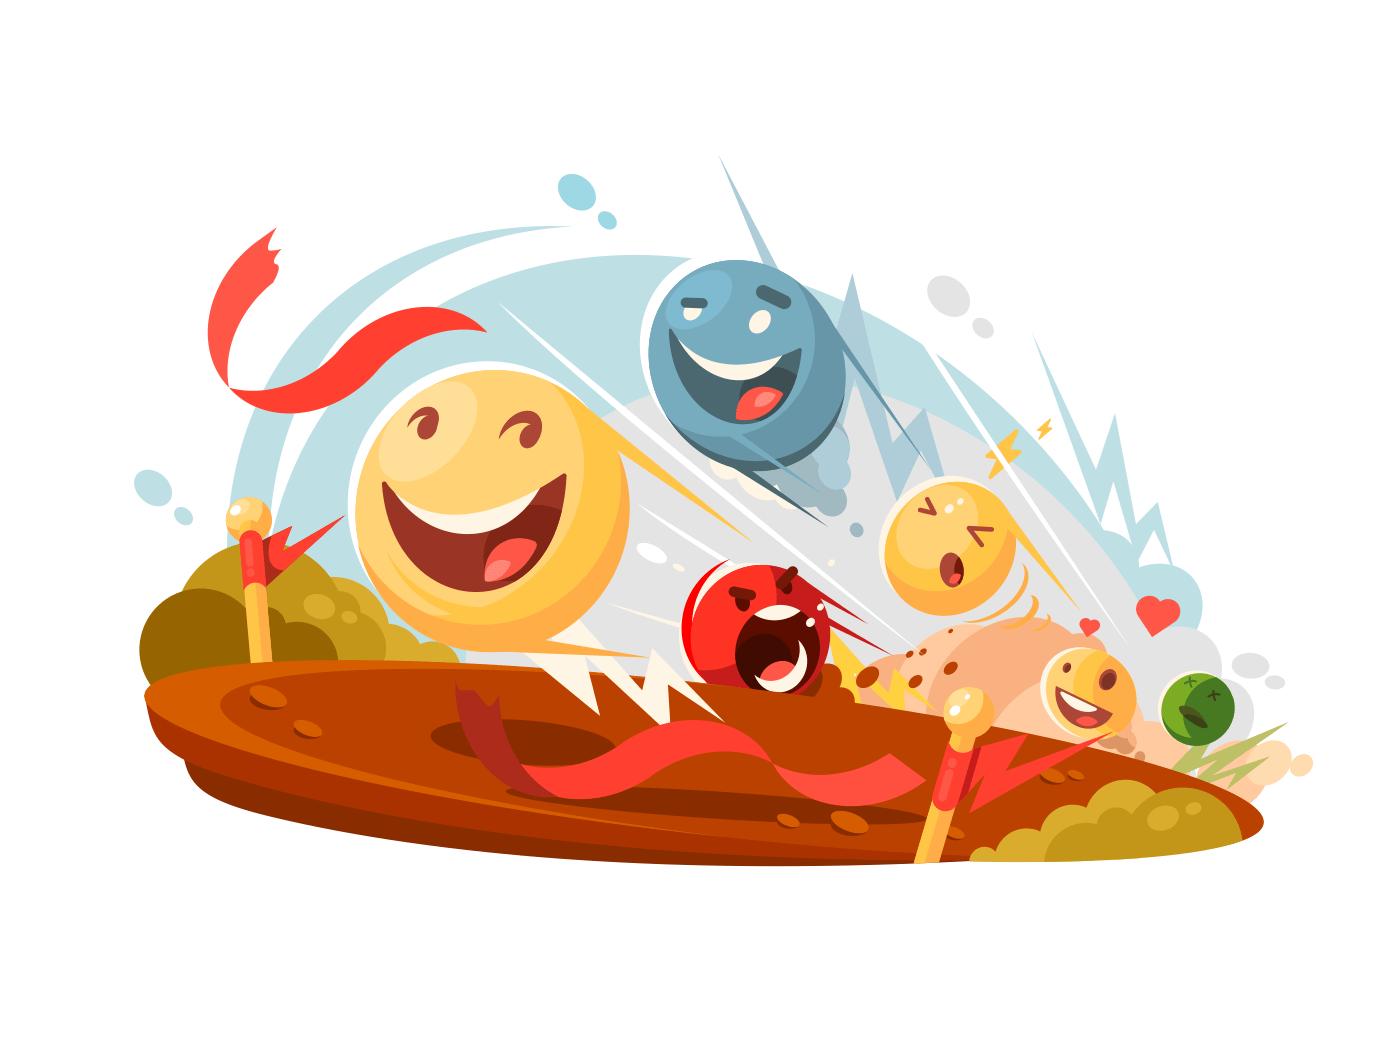 Funny emotional smileys in race illustration